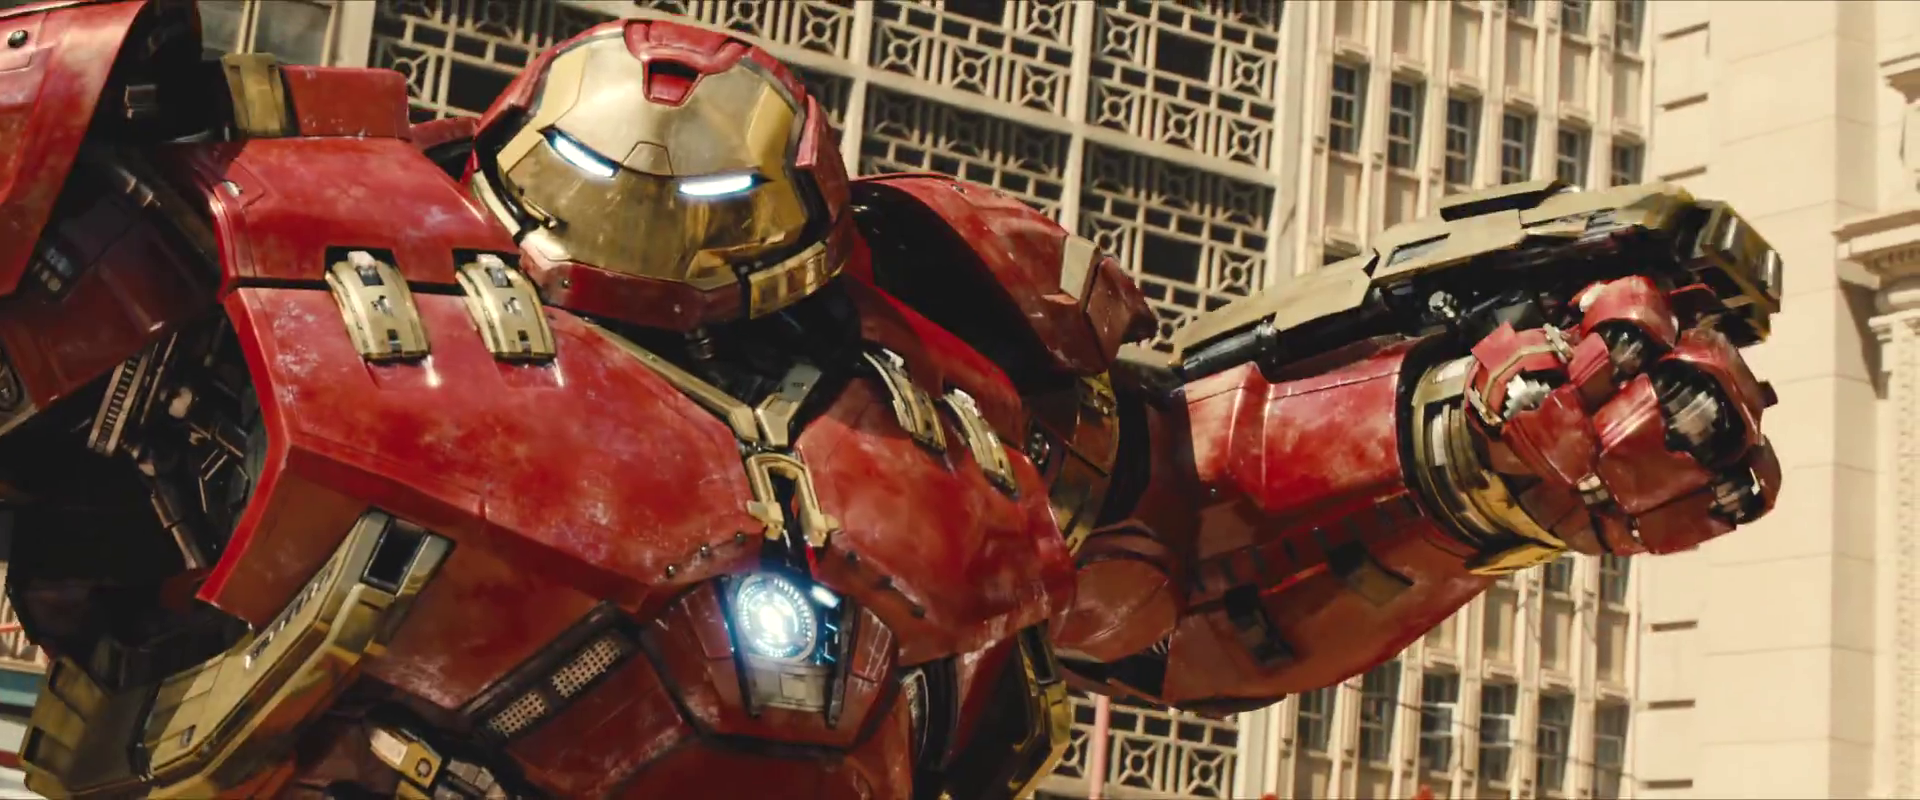 Avengers Age Of Ultron Trailer Screengrab 31 Hulkbuster